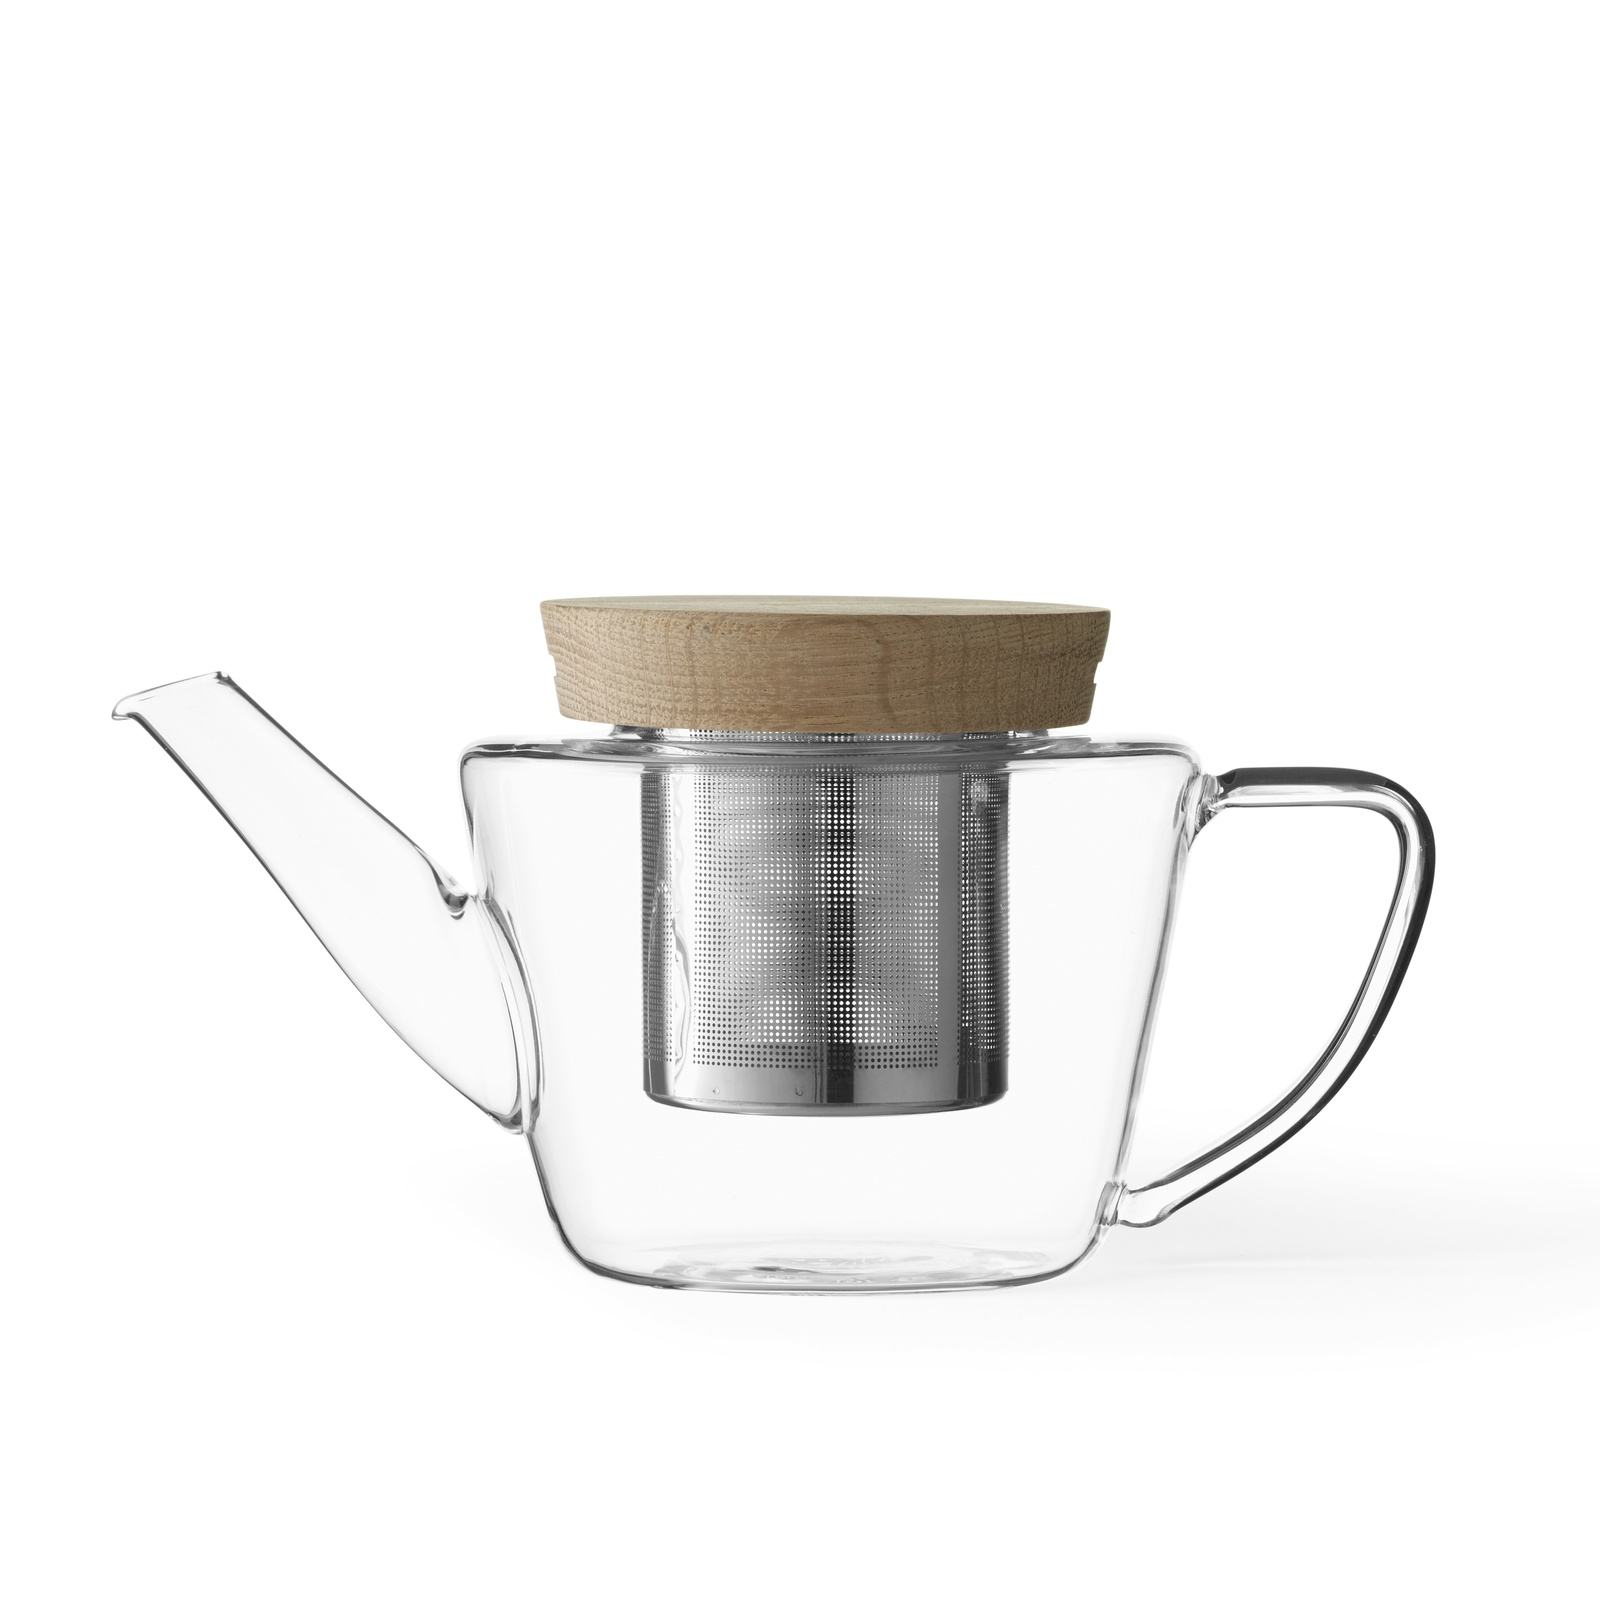 Чайник заварочный с ситечком Viva scandinaviaInfusion 0,6л.